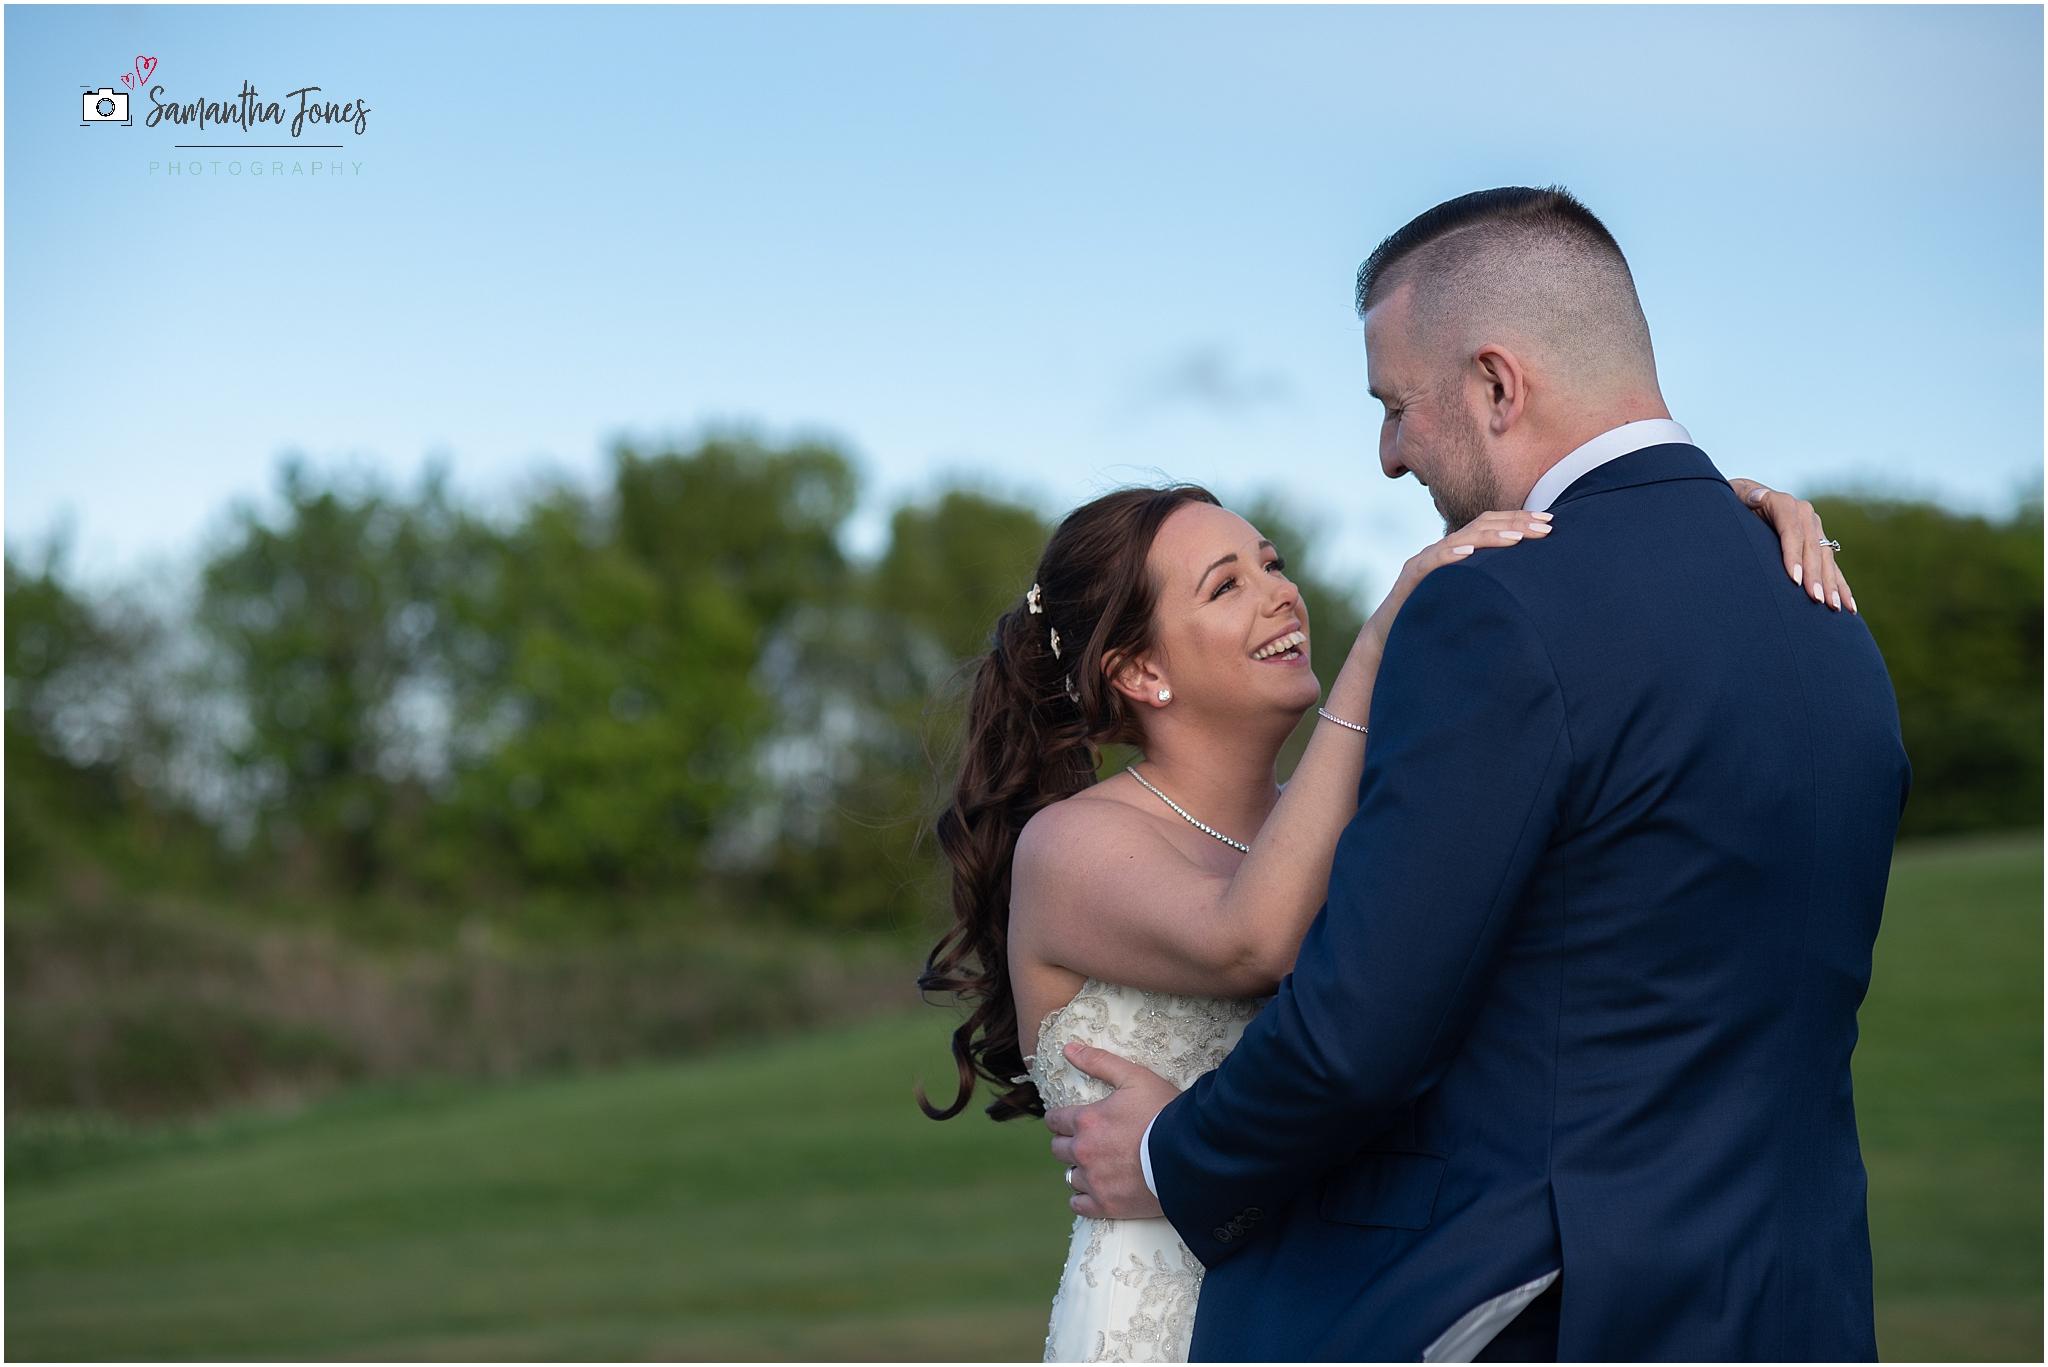 Emma and Aaron twilight wedding at Stonelees bride and groom portraits